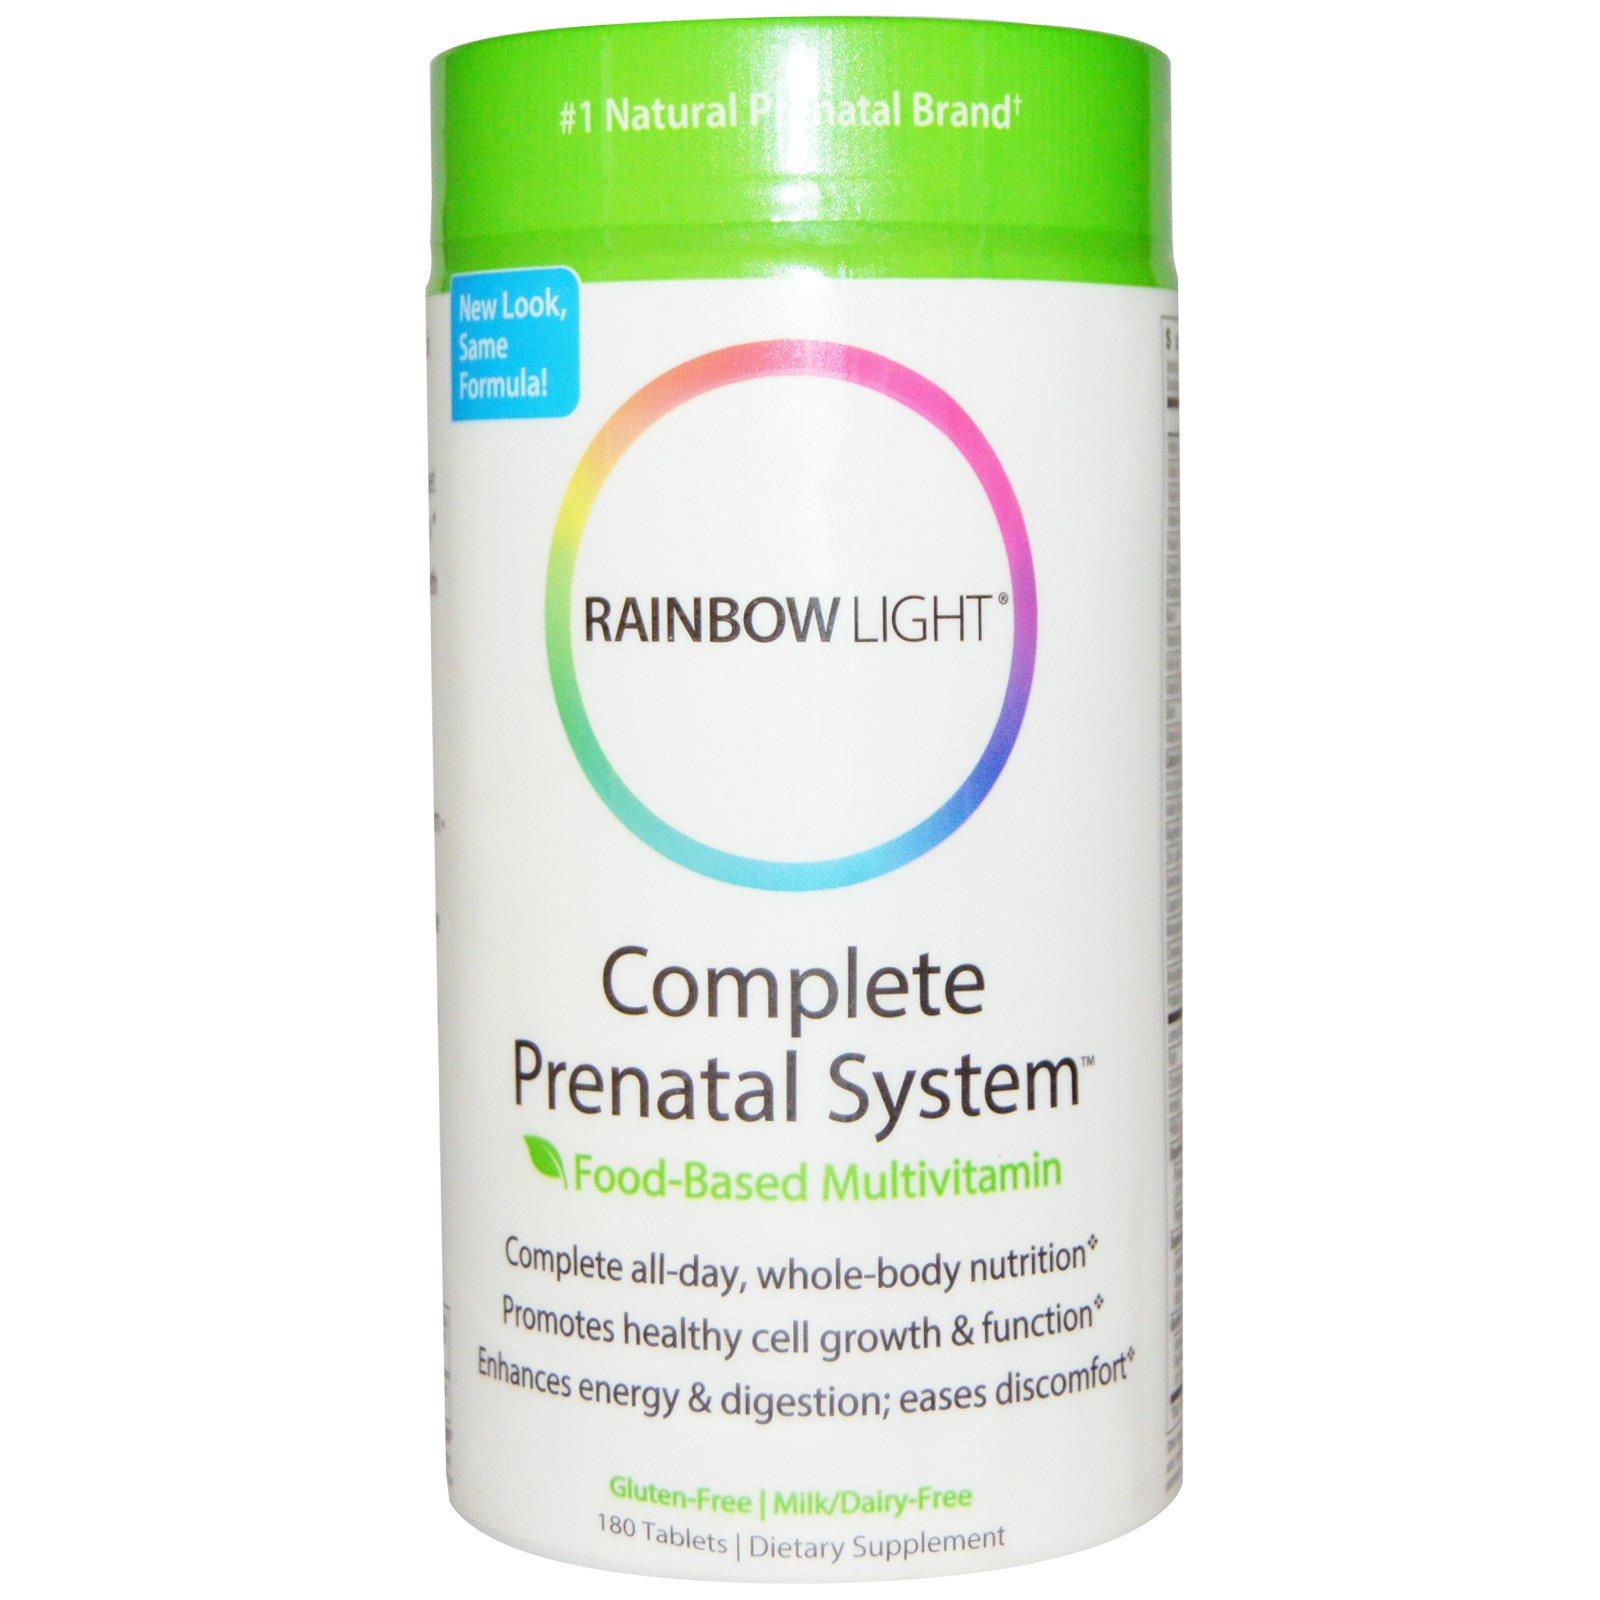 Rainbow Light, Complete Prenatal System, пищевые мультивитамины, 180 таблеток